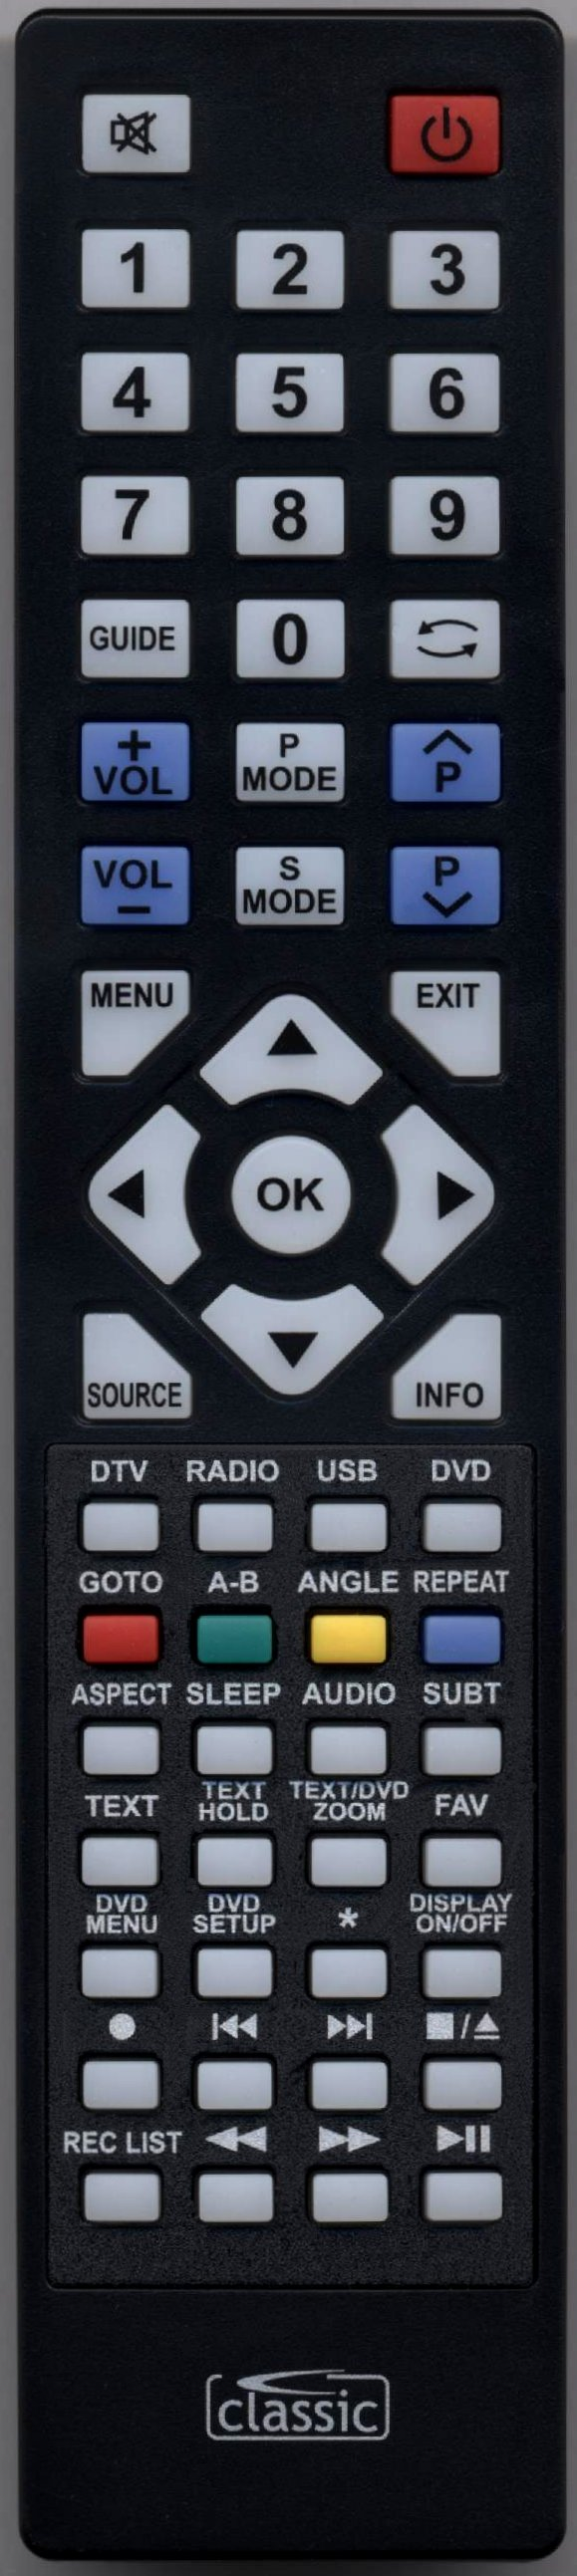 BLAUPUNKT 50/238Z-GB-5B2-FGKUP-UK Remote Control Alternative